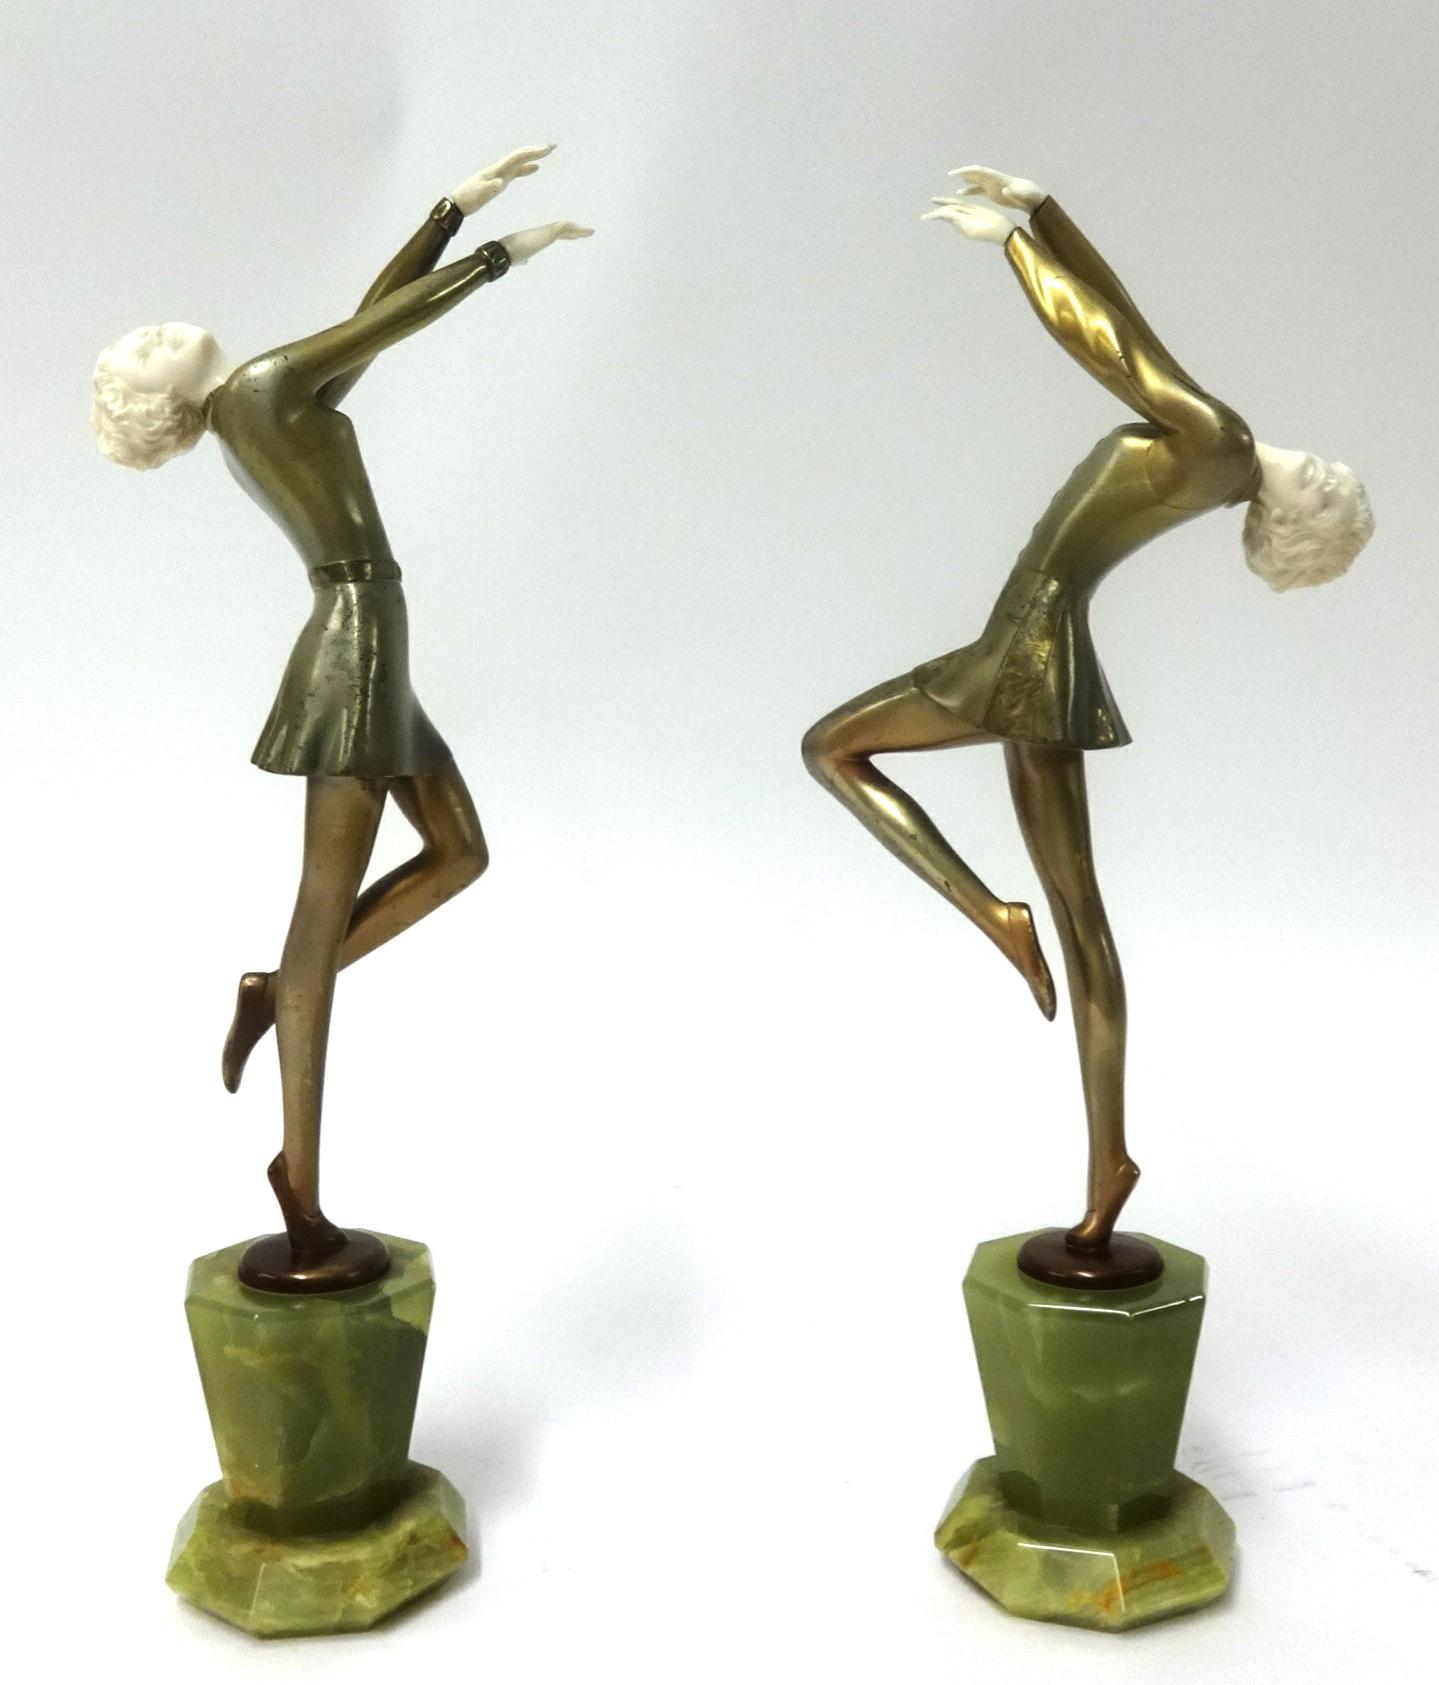 Lot 008 - Lorenzi, a pair of bronze art deco figures of Dancing Girls, stamped 'Lorenzi, made in Austria, Real